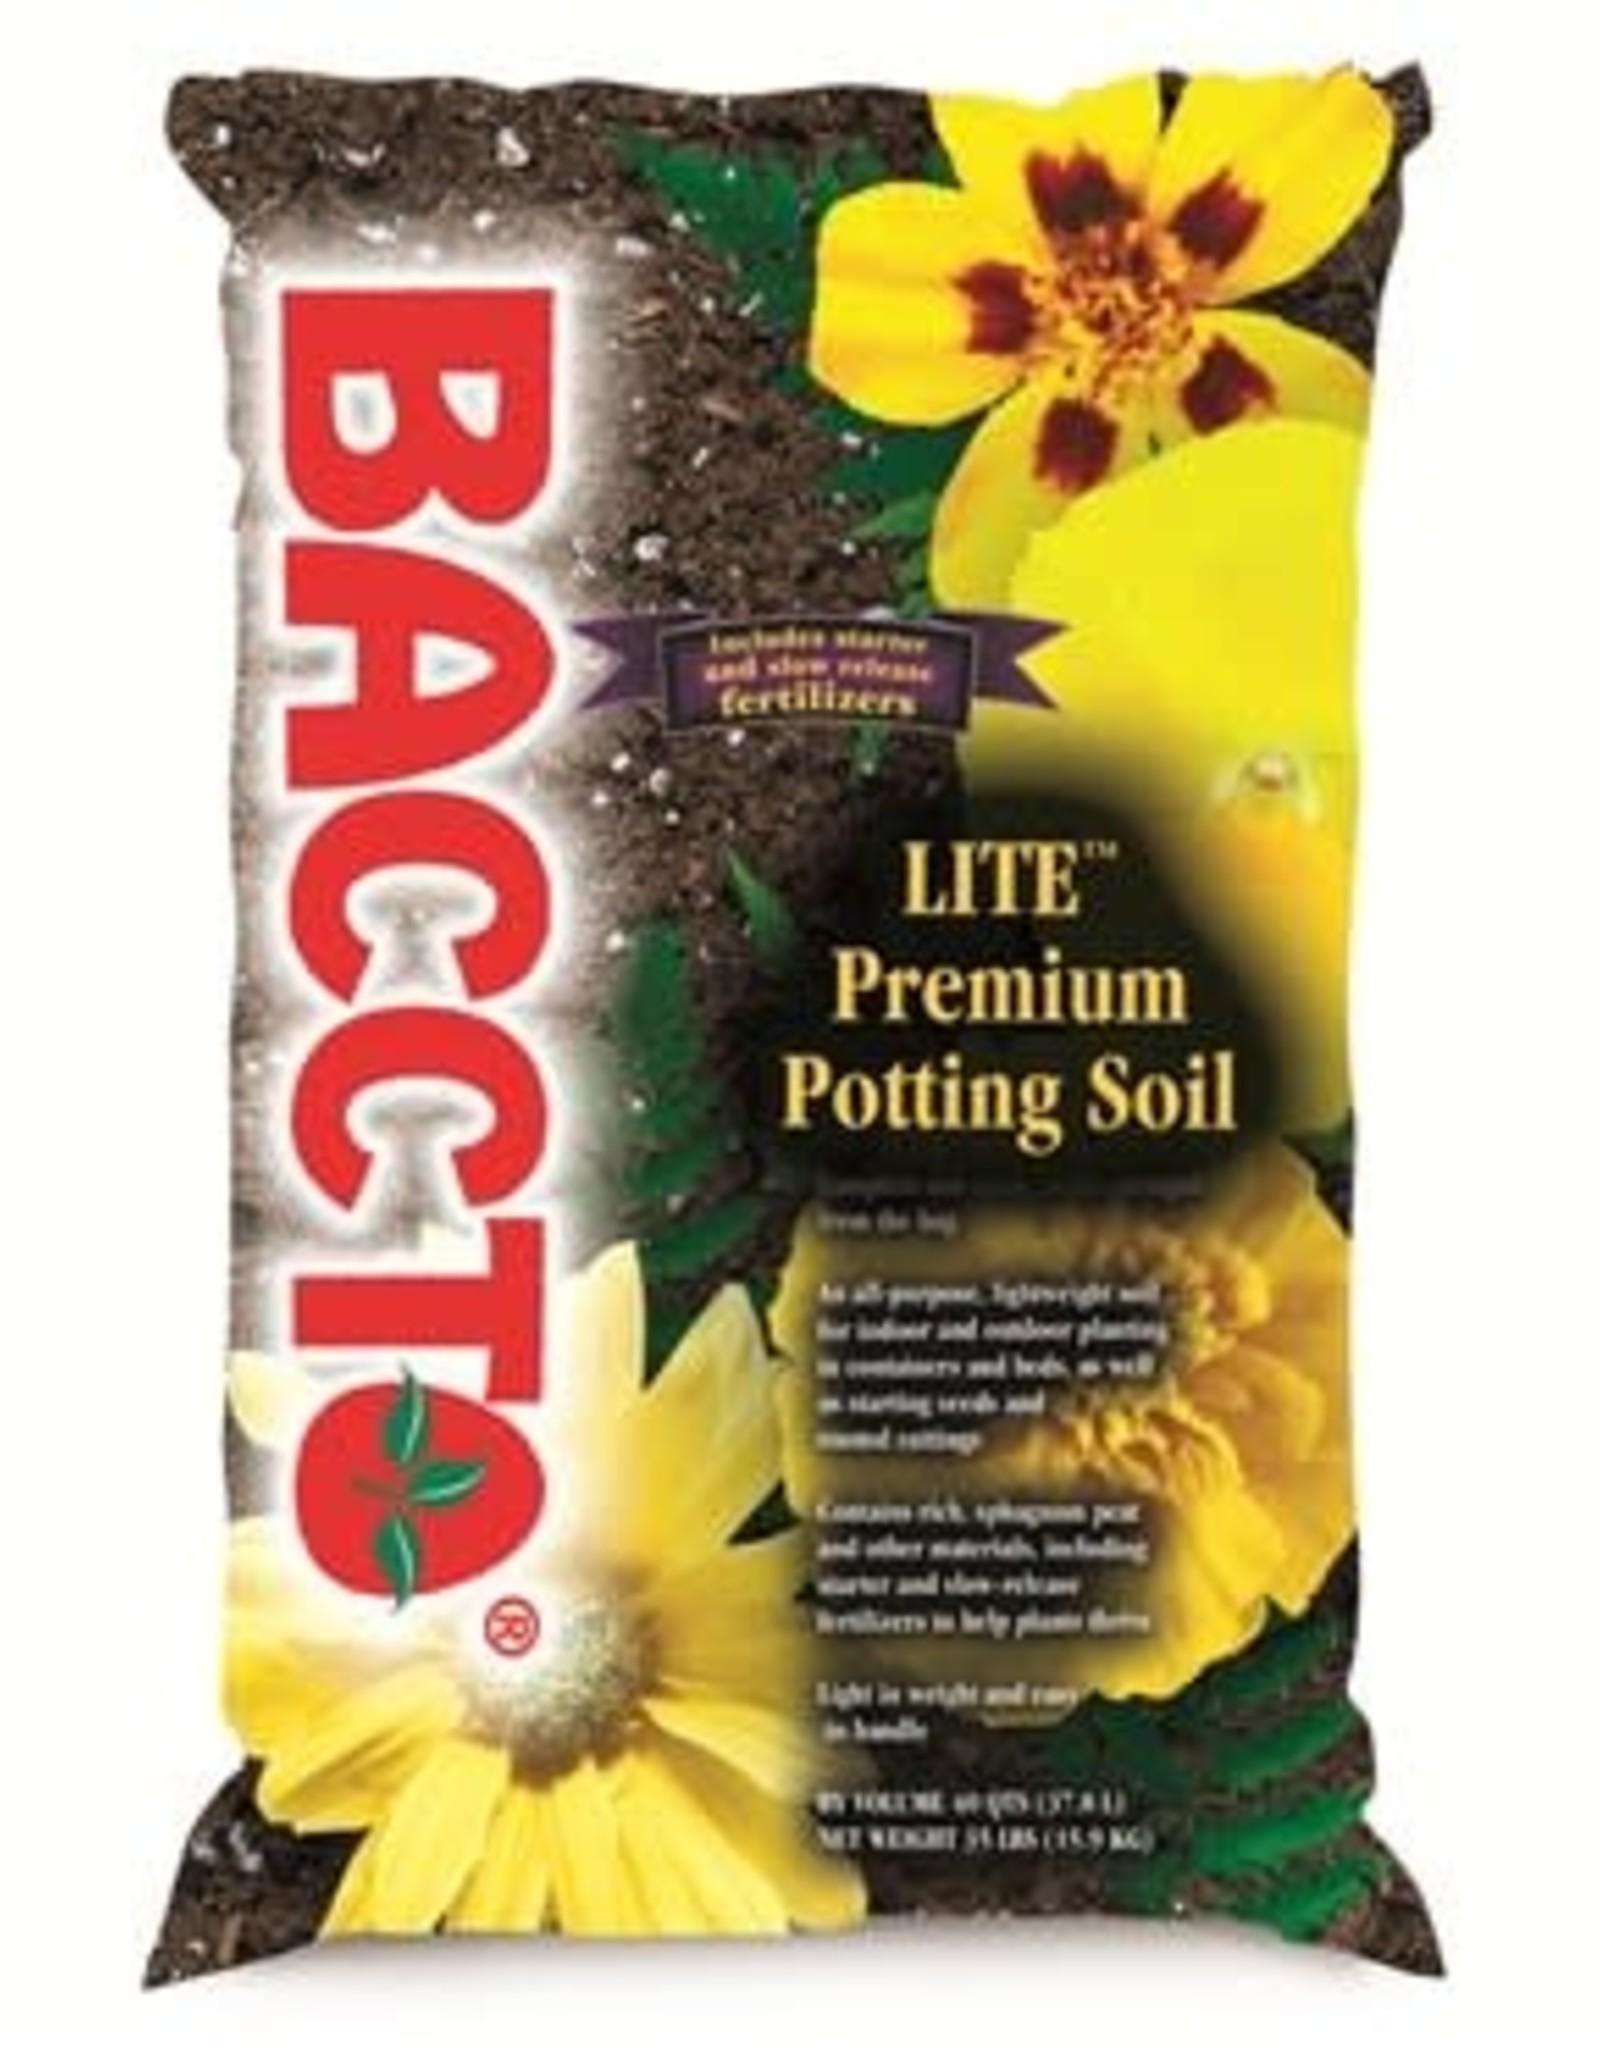 Baccto Lite Premium Potting Soil